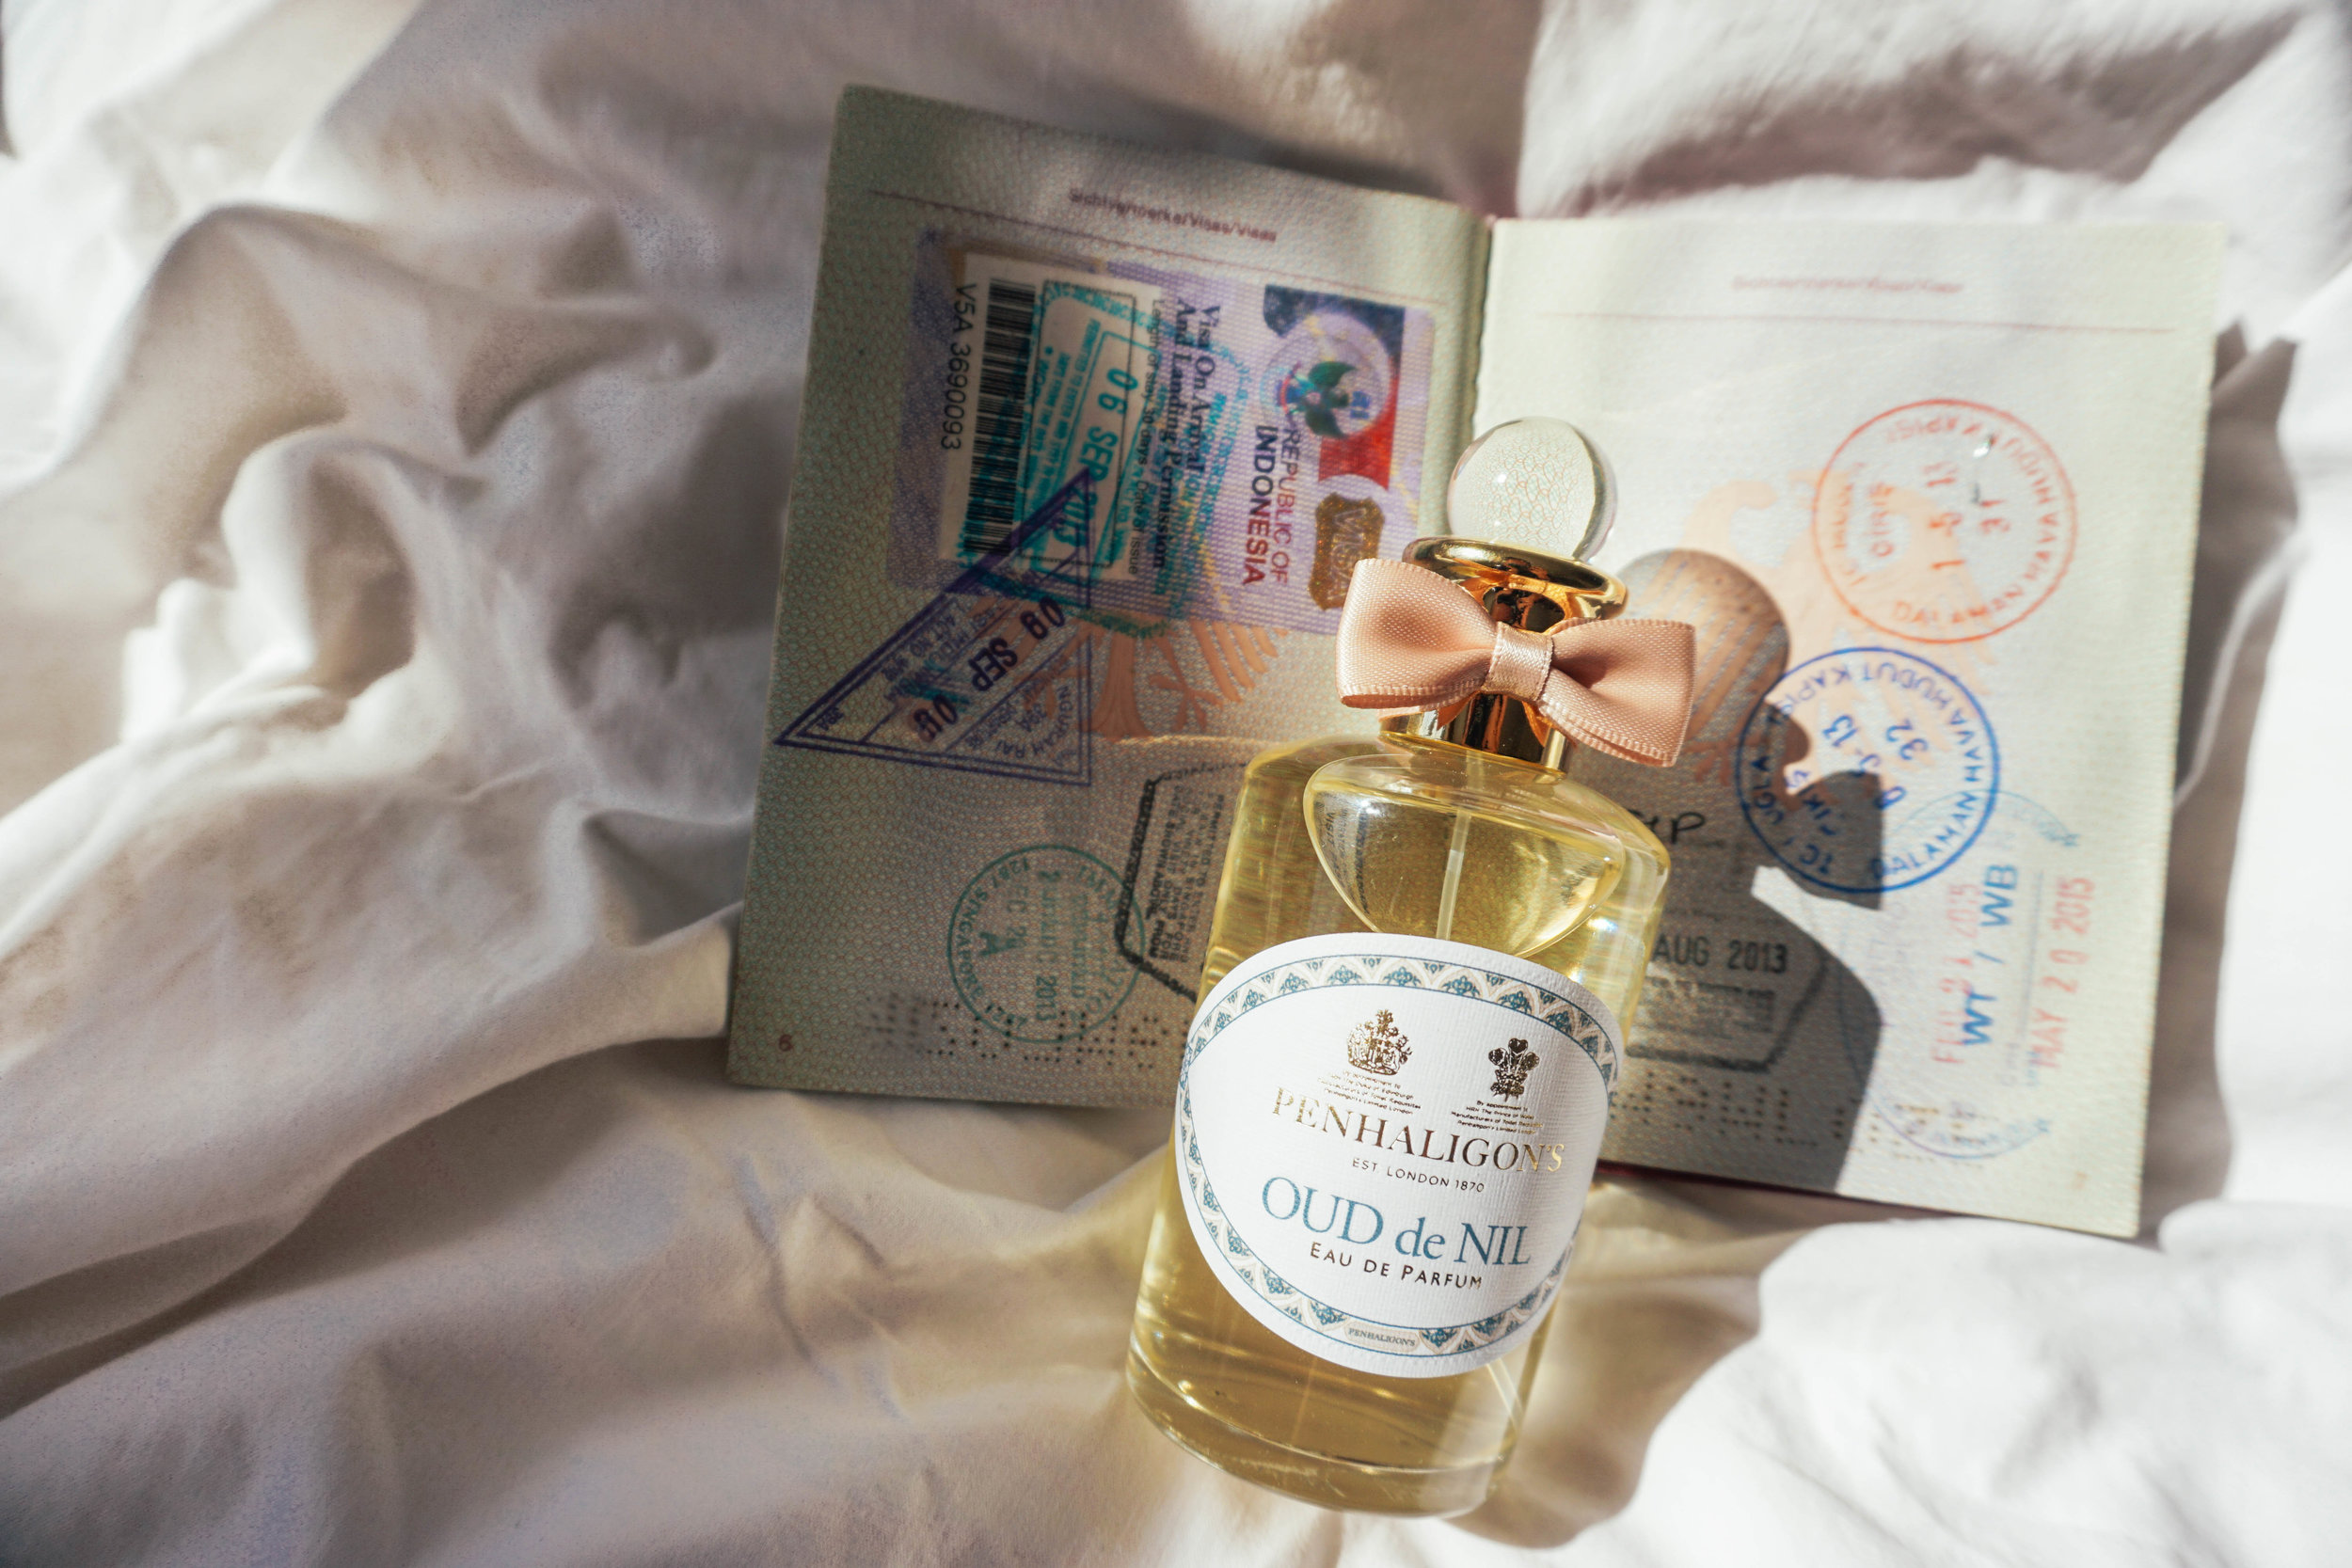 Penhaligons, New Trade Route Collection. Oud de Nil and Alizarin.